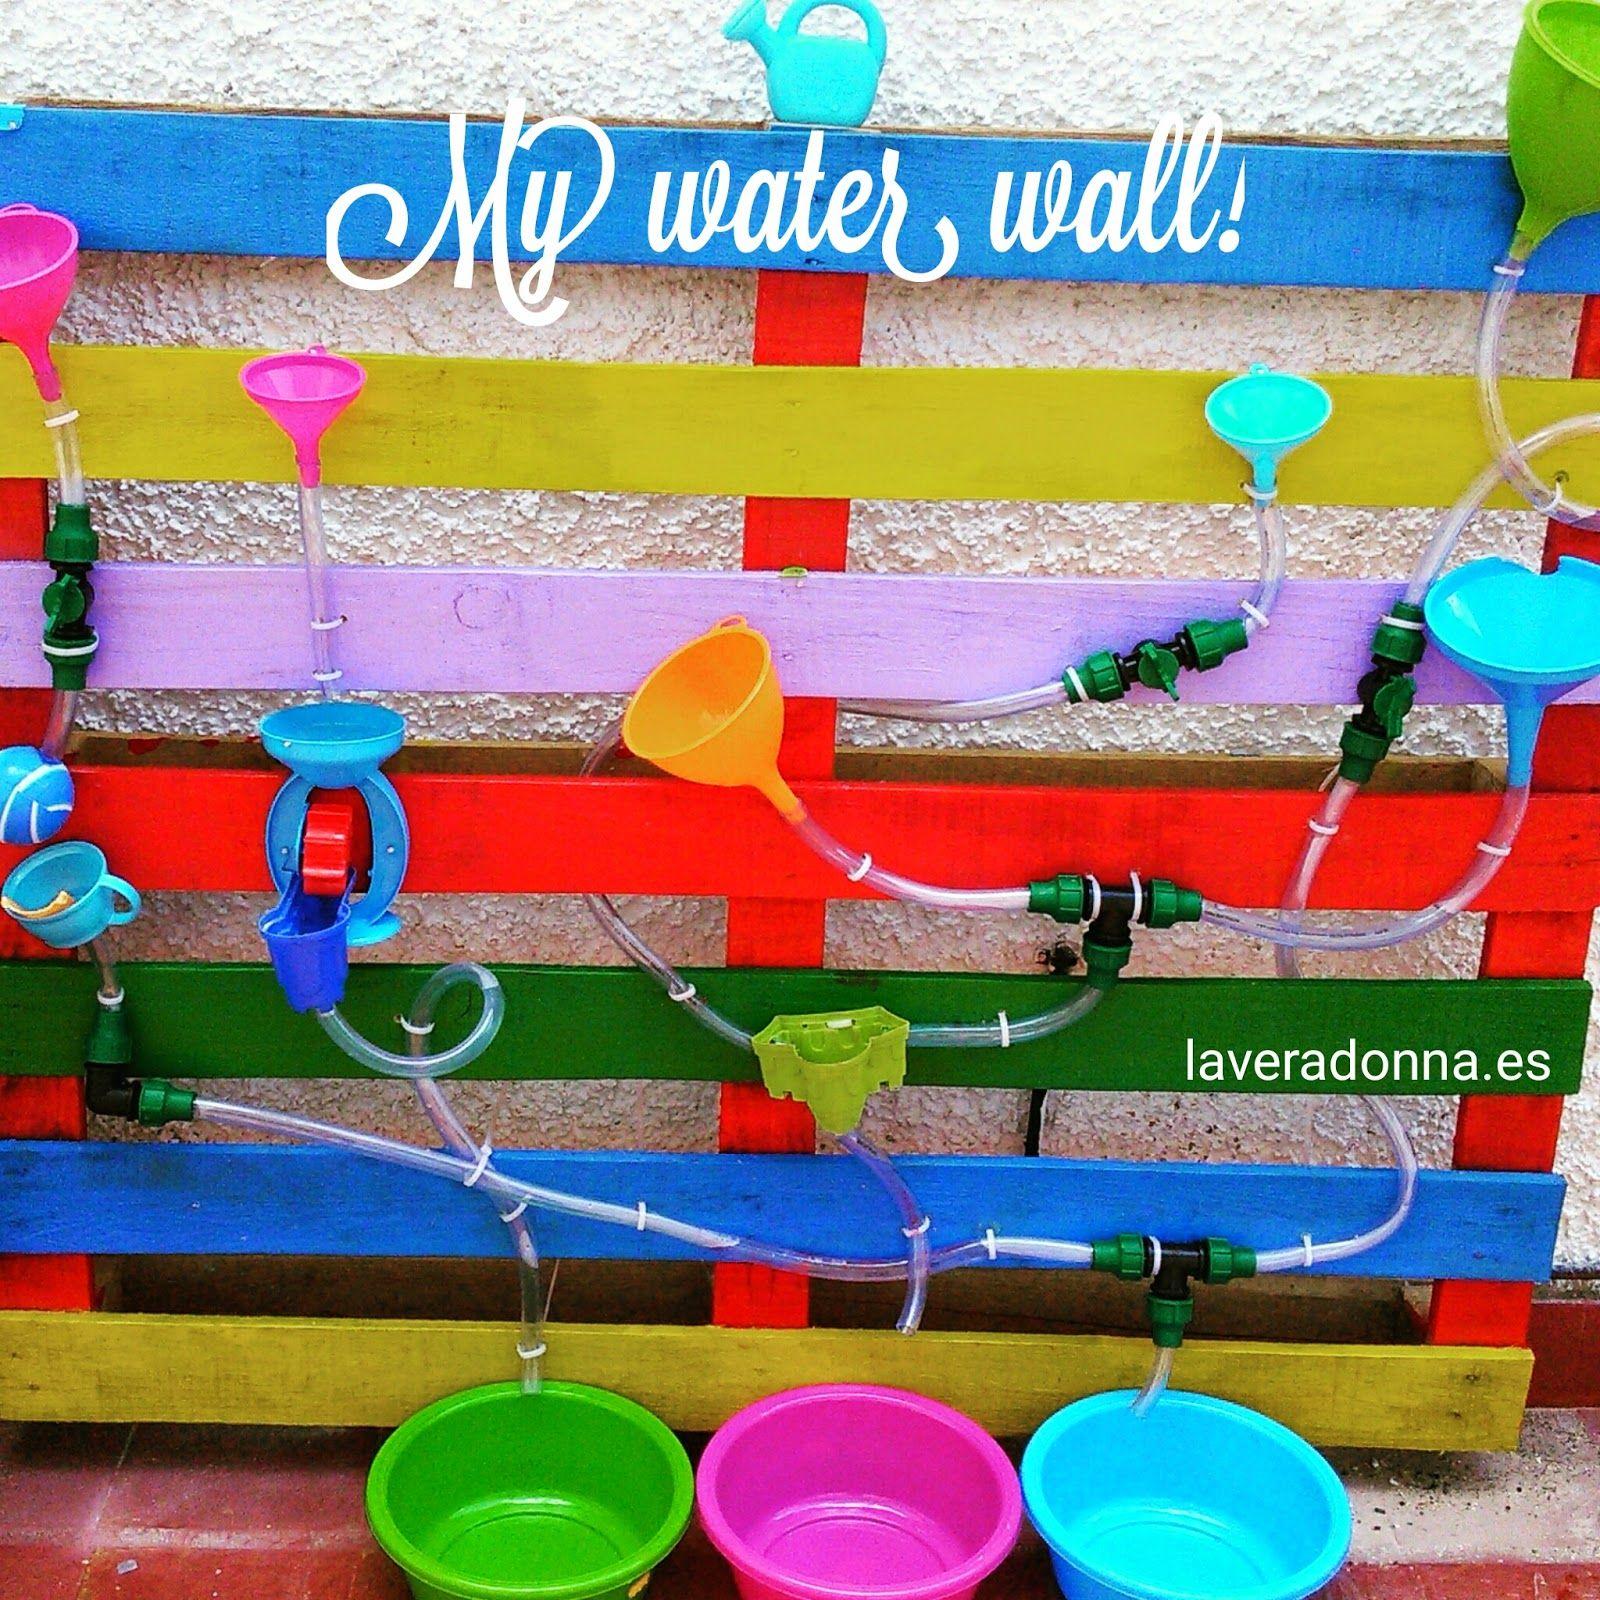 Pared de agua | collaborative making projects | Pinterest | Agua ...